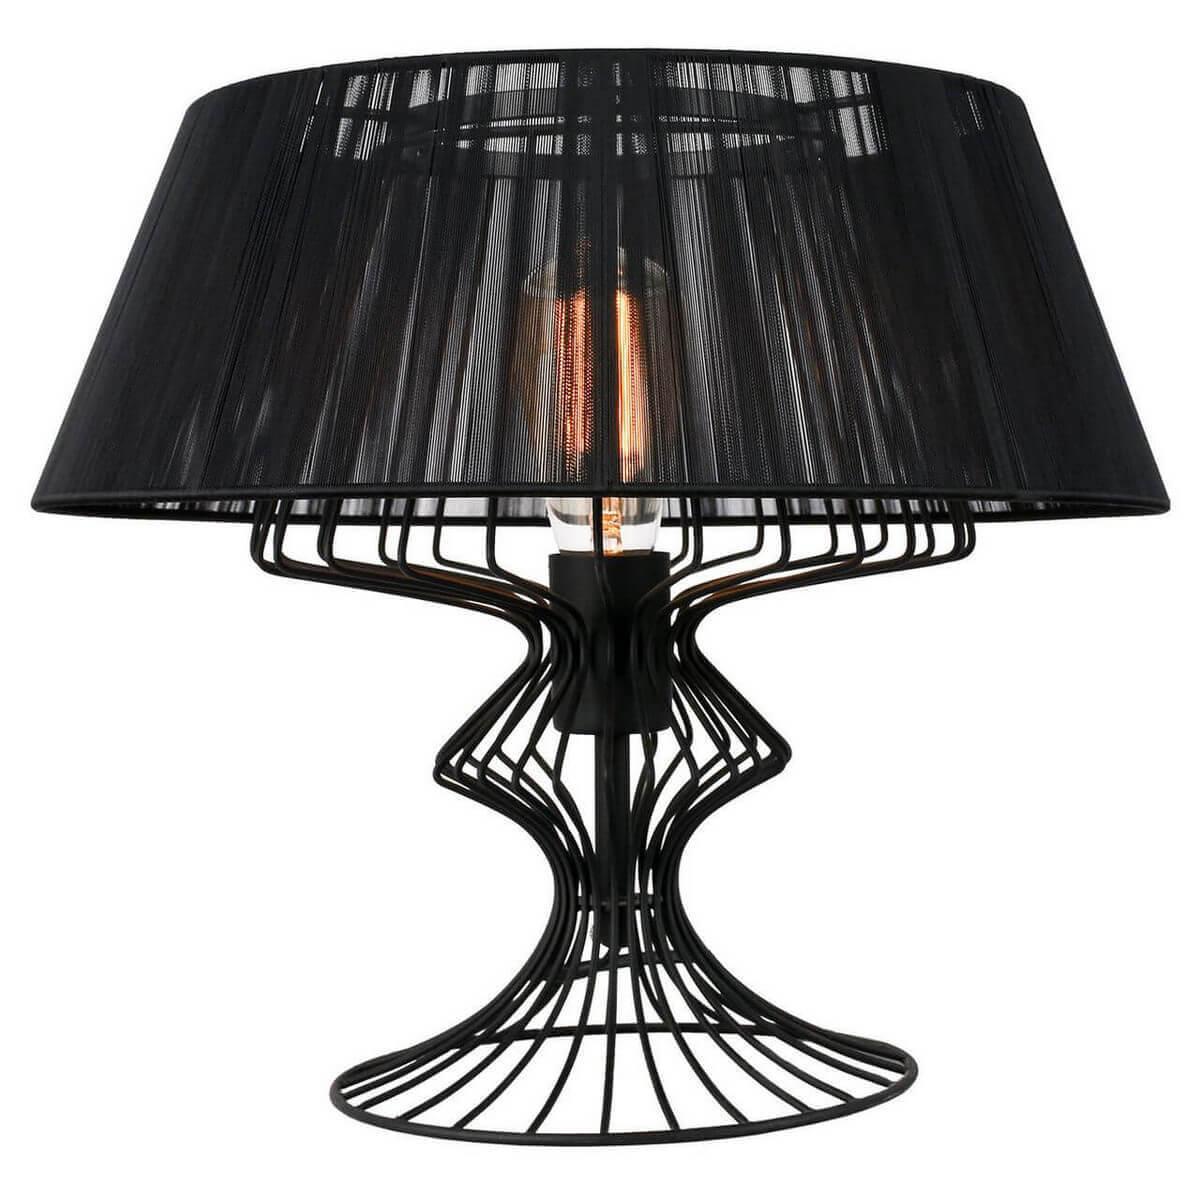 цена Настольная лампа Lussole Loft Cameron LSP-0526 онлайн в 2017 году